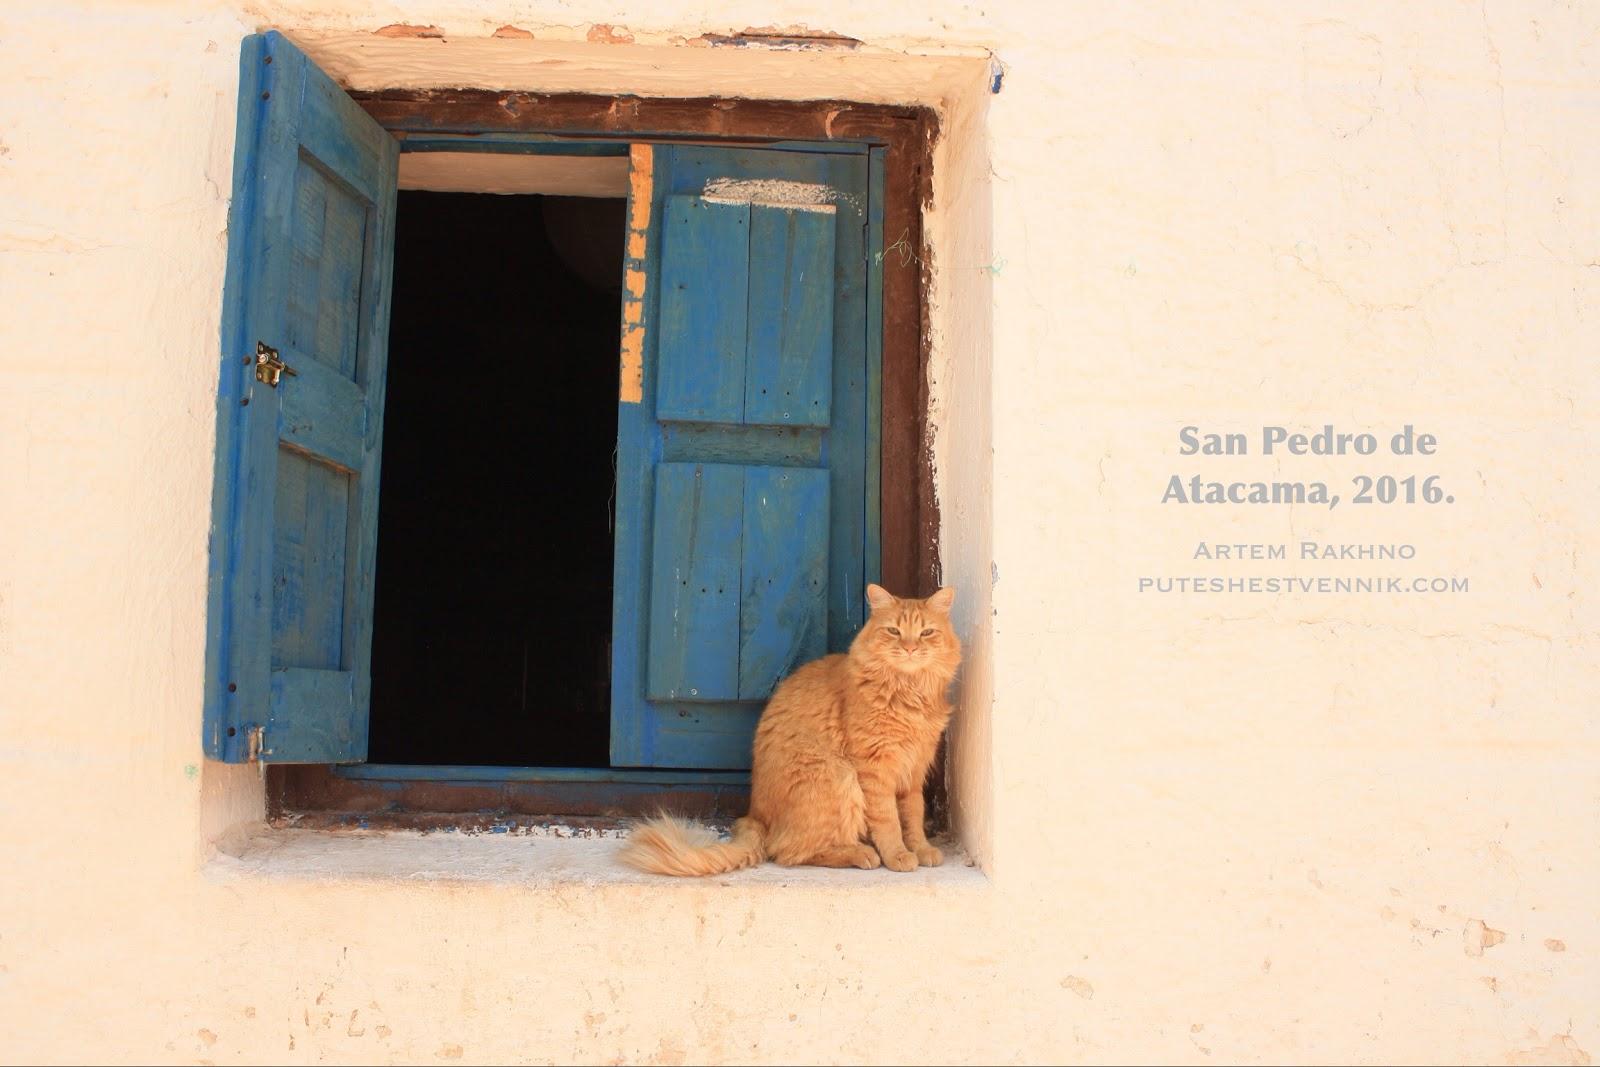 Кот у окна в Сан-Педро-де-Атакама